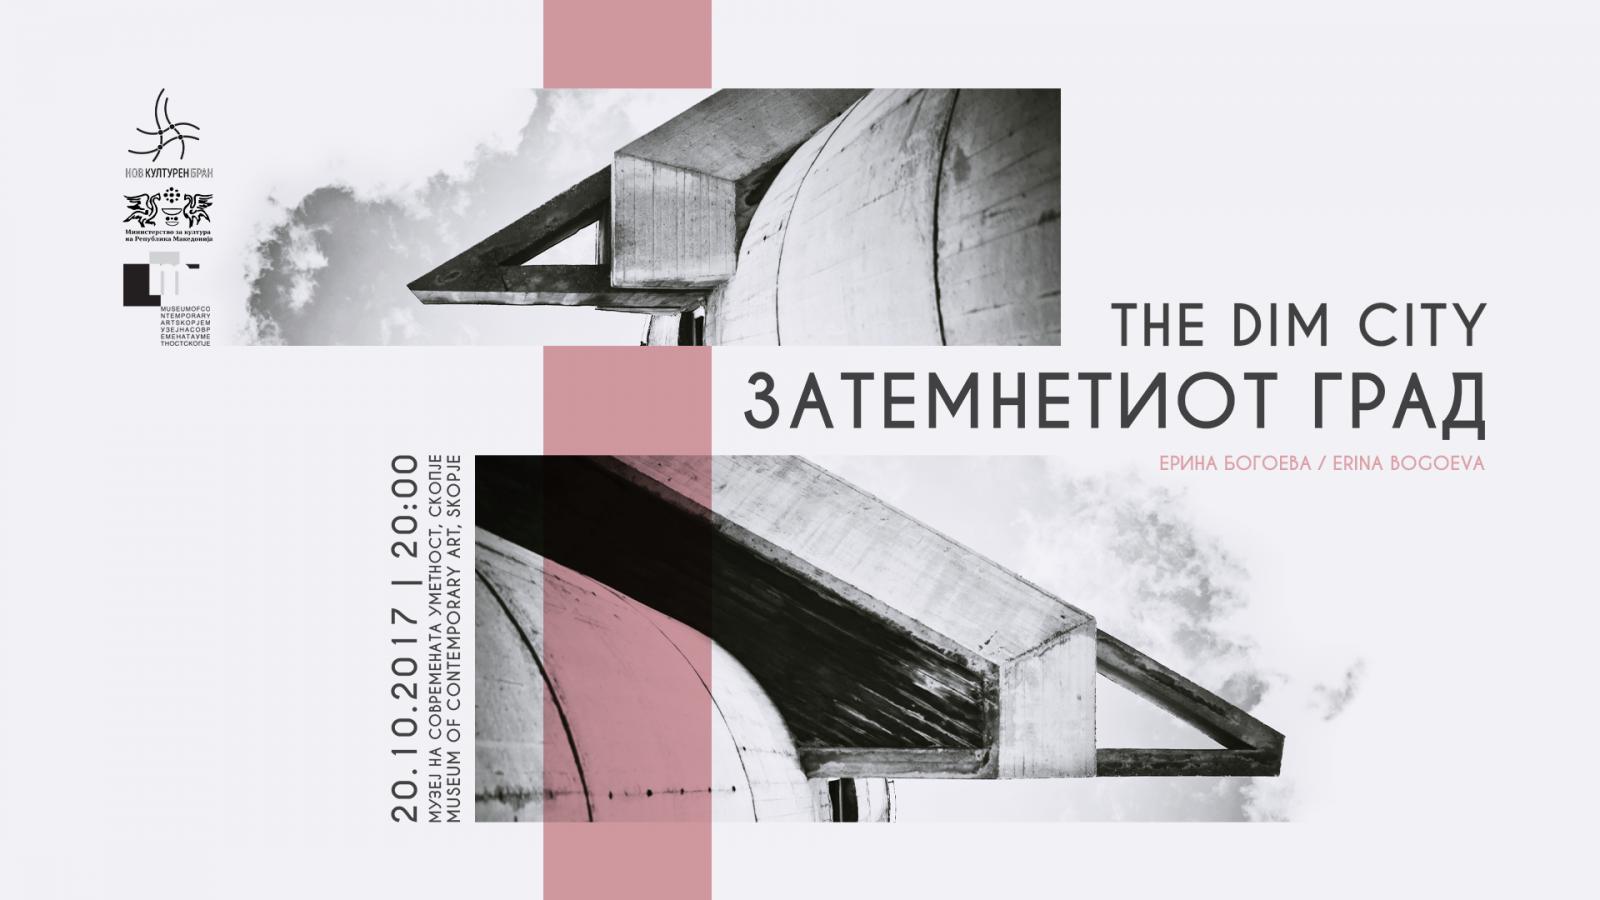 izlozhba-na-erina-bogoeva-zatemnetiot-grad-vo-muzej-na-sovremena-umetnost